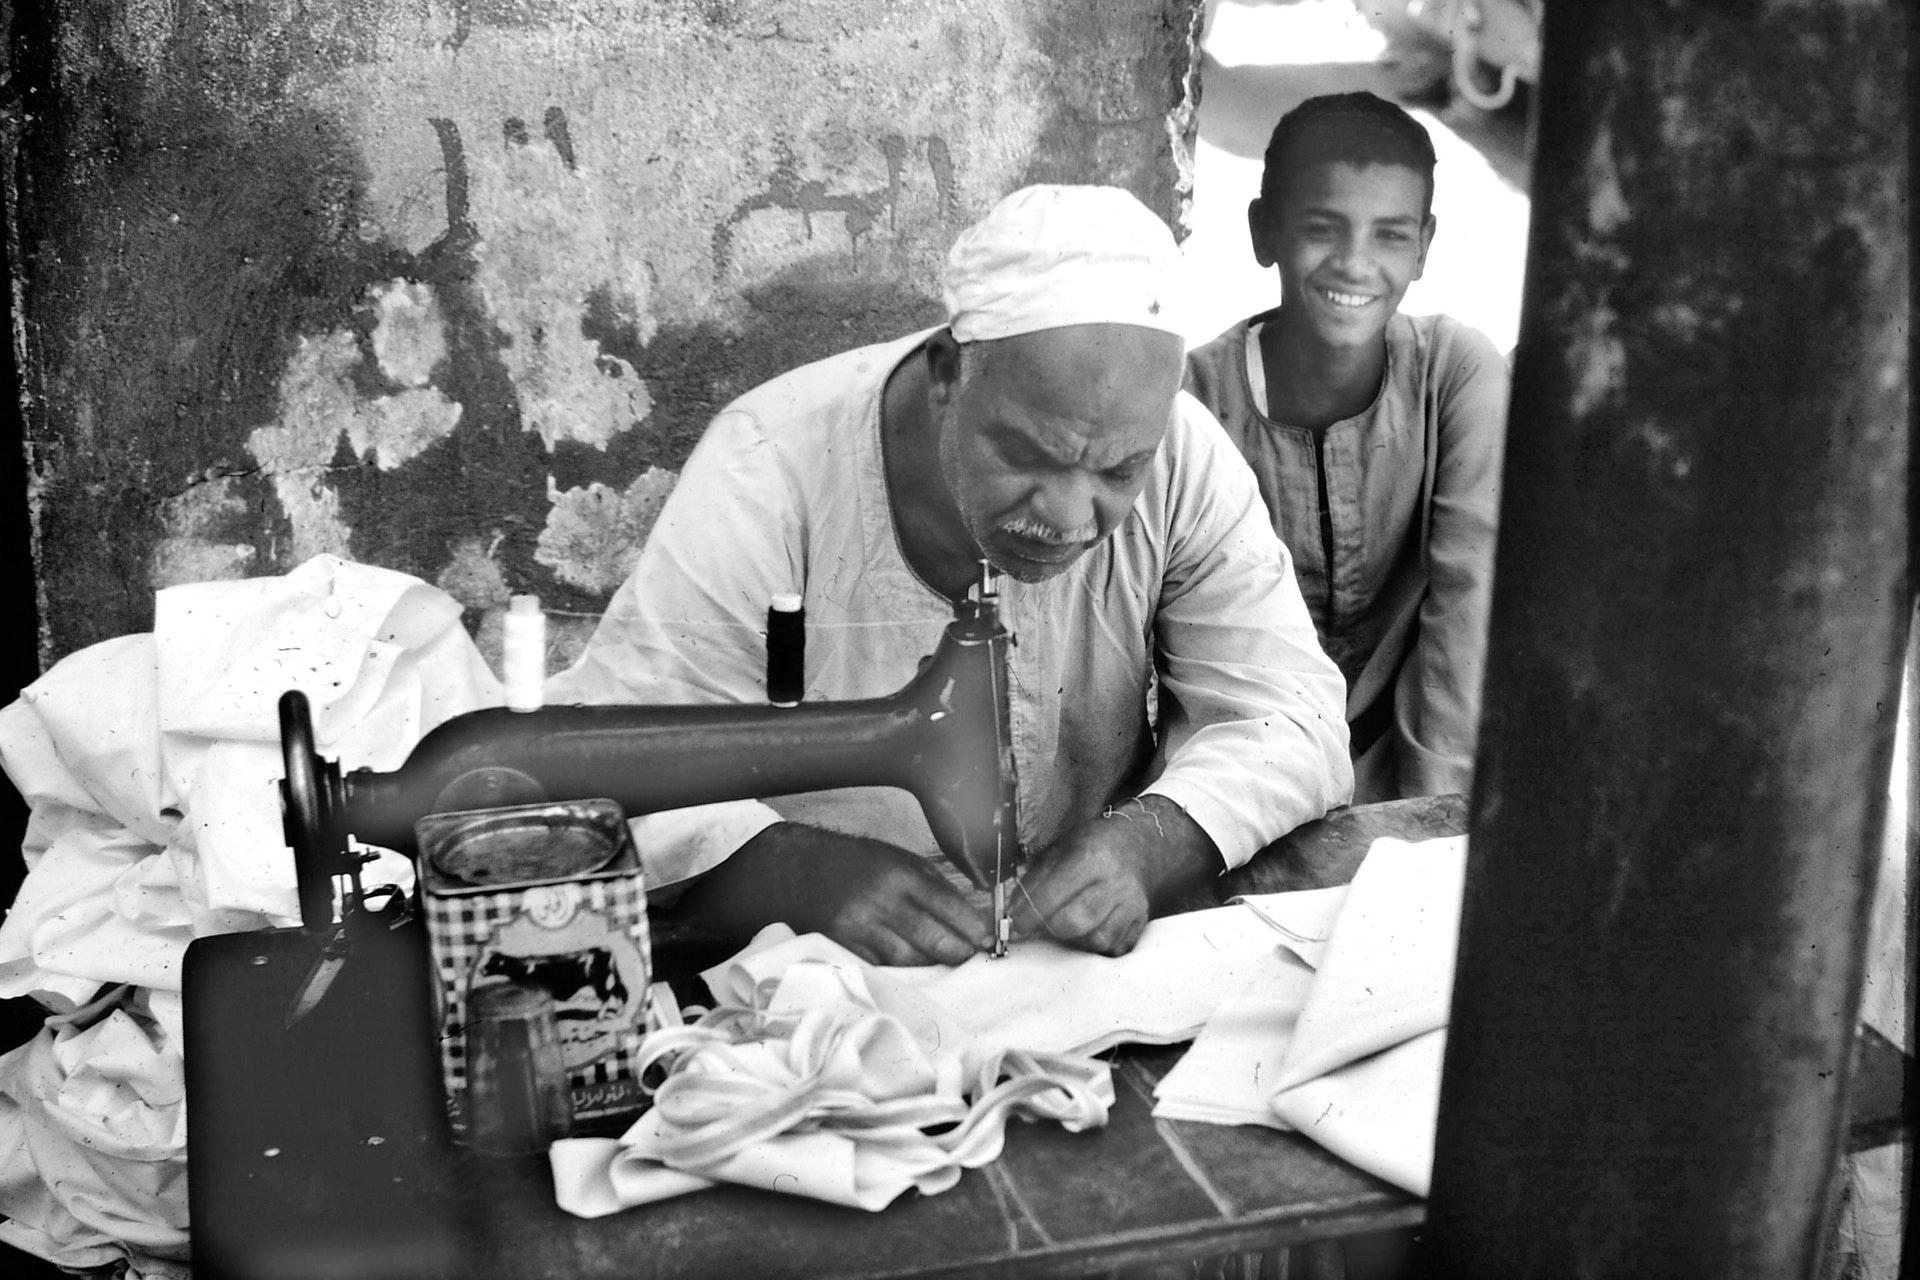 Computerized sewing machine vs mechanical sewing machine